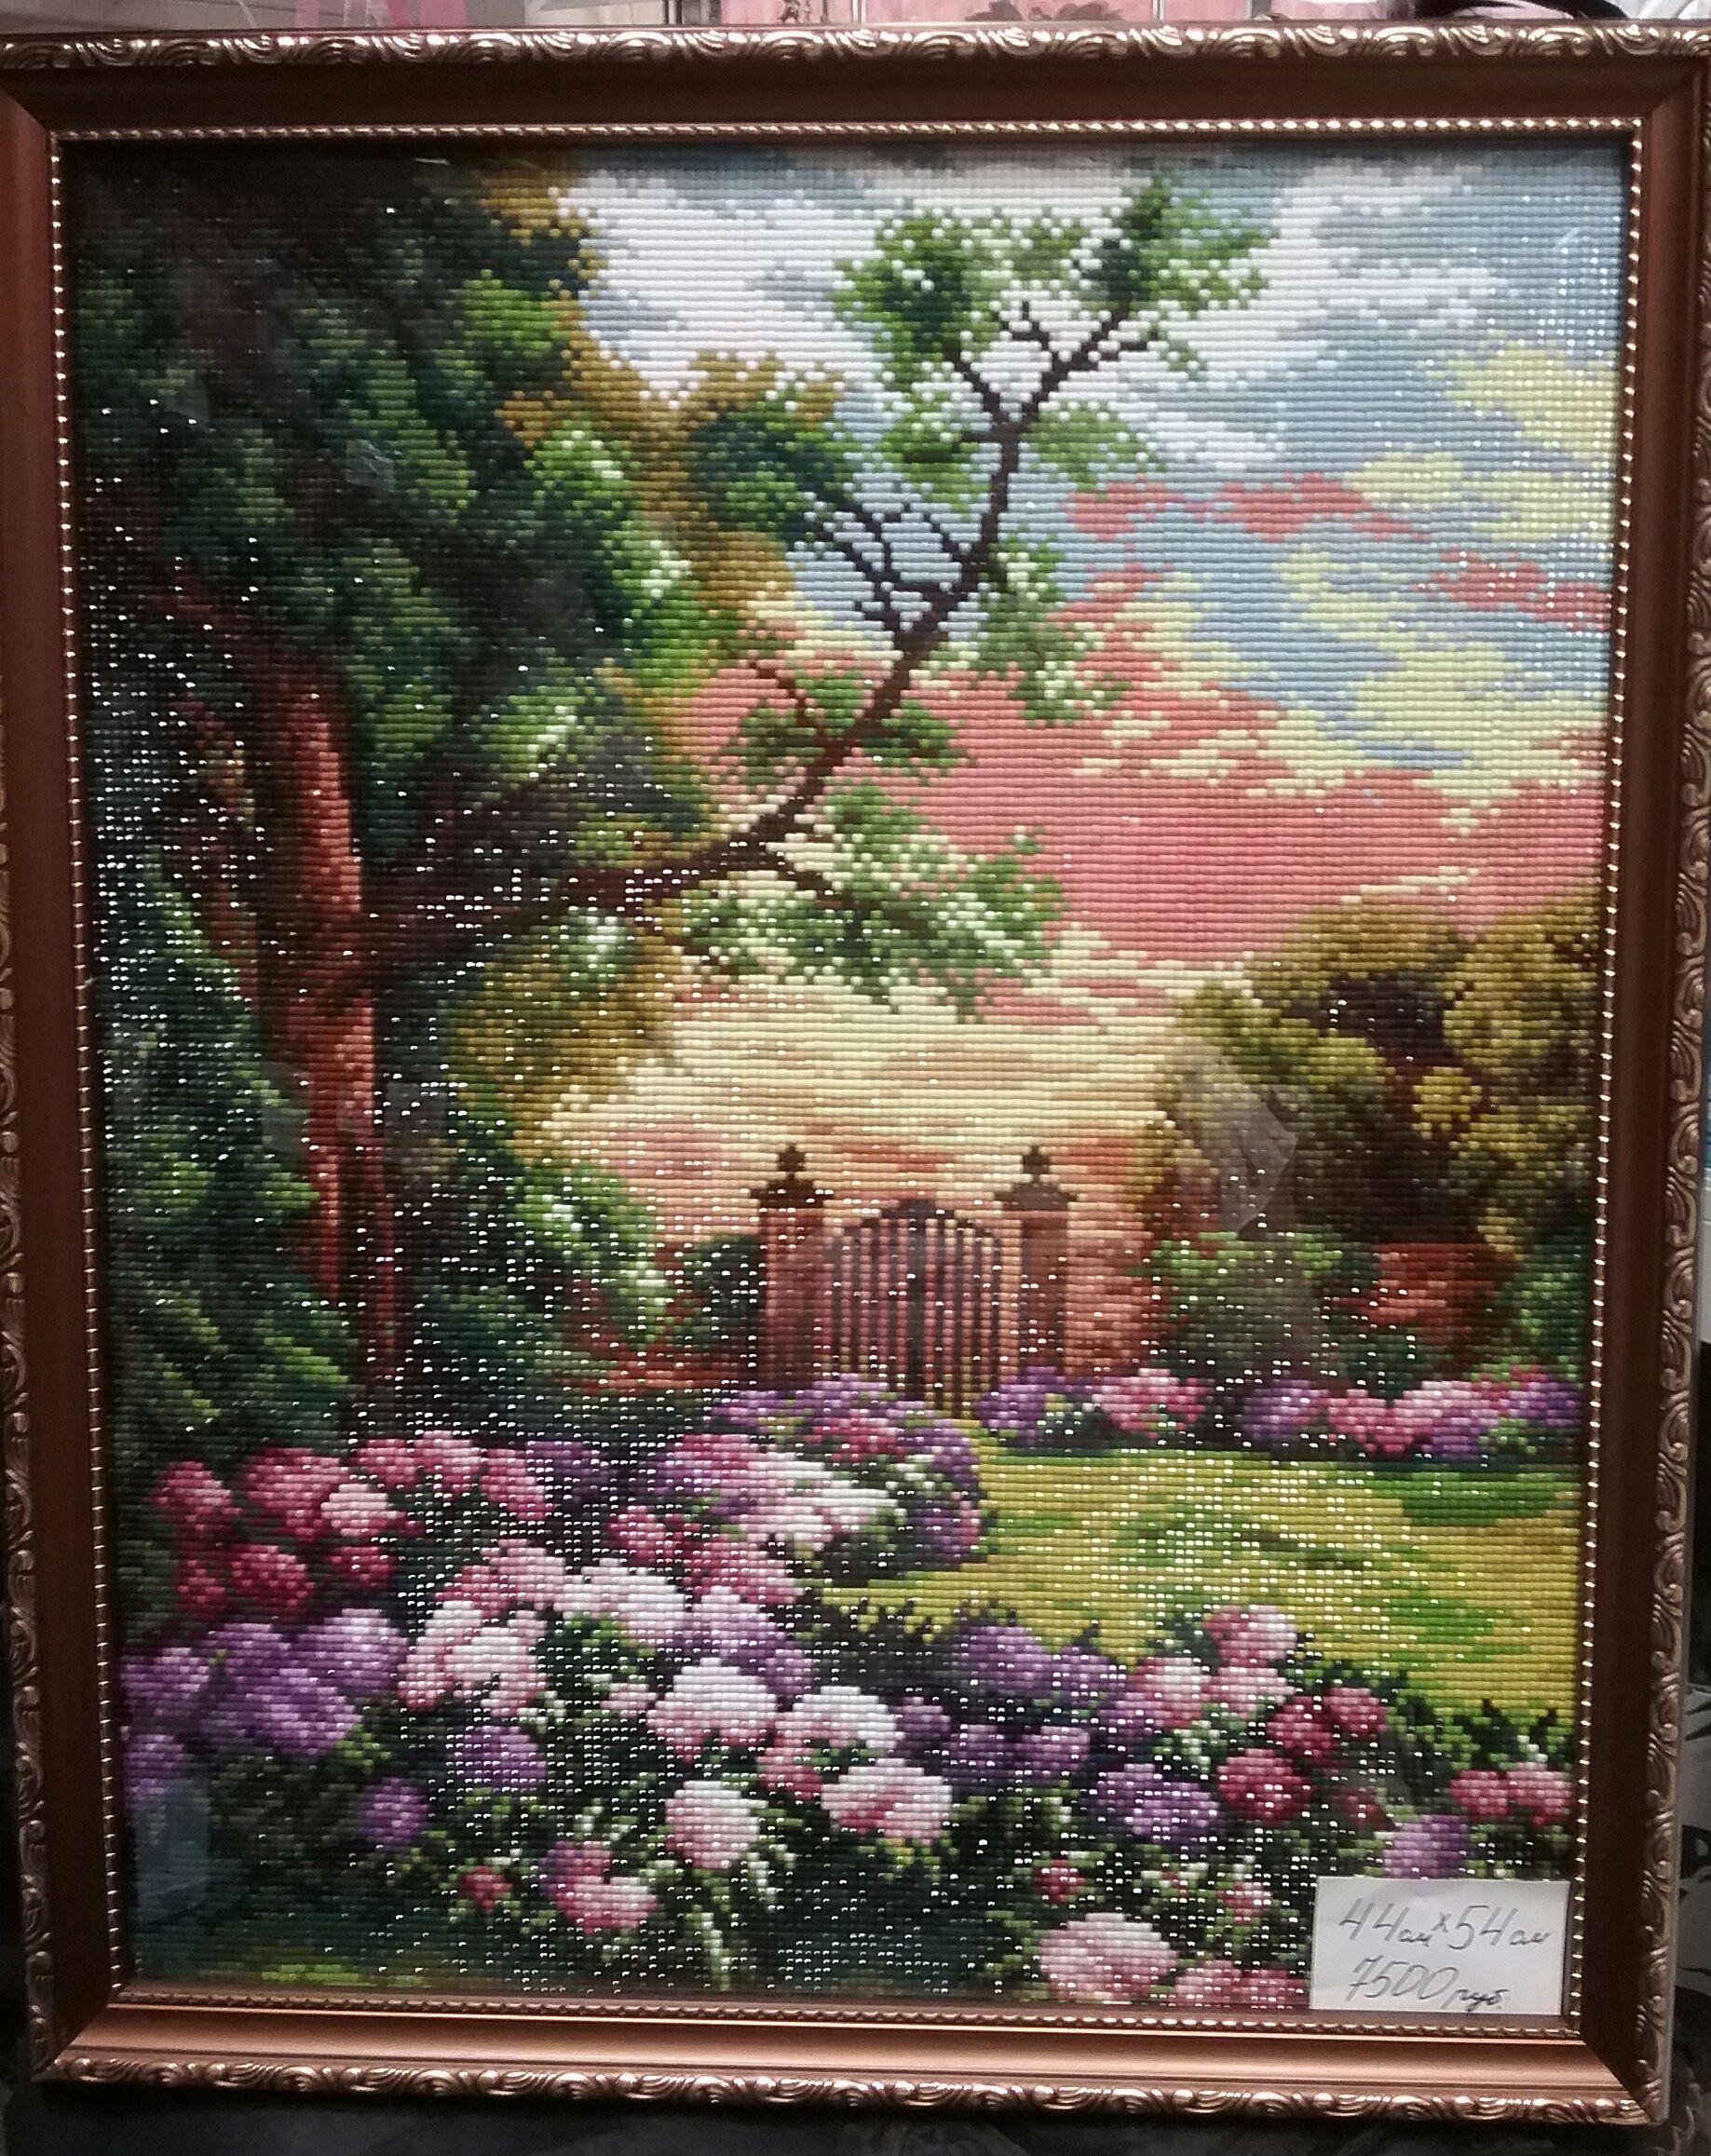 багет подарок живопись пейзаж мозайка алмаз натюрморт картинакартины